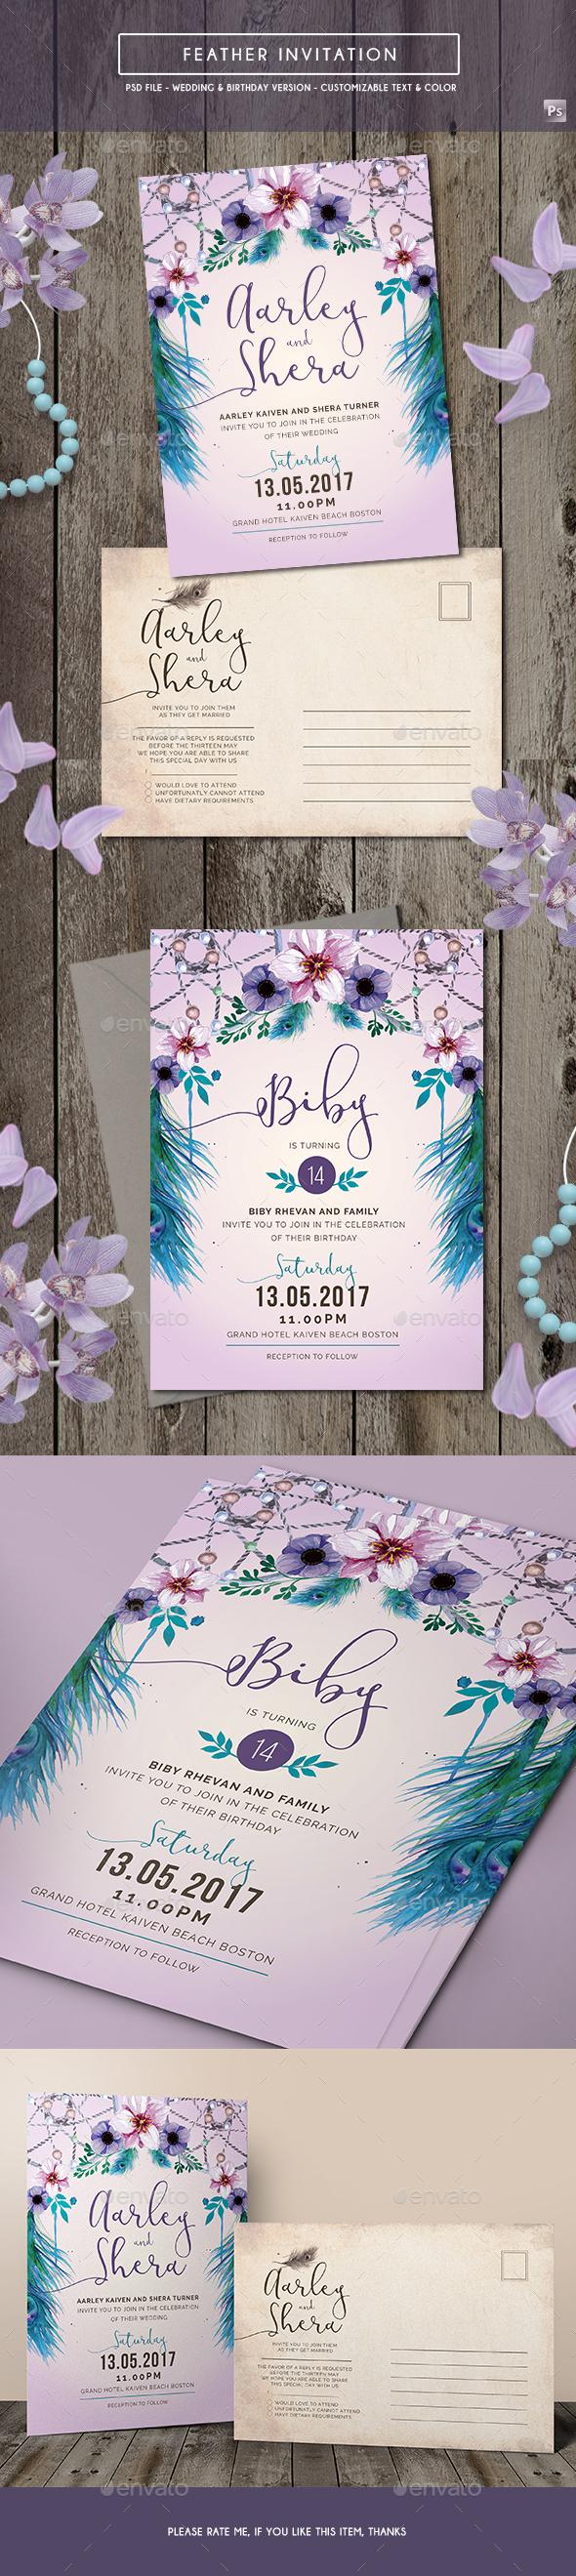 Feather Invitation (Wedding & Birthday)